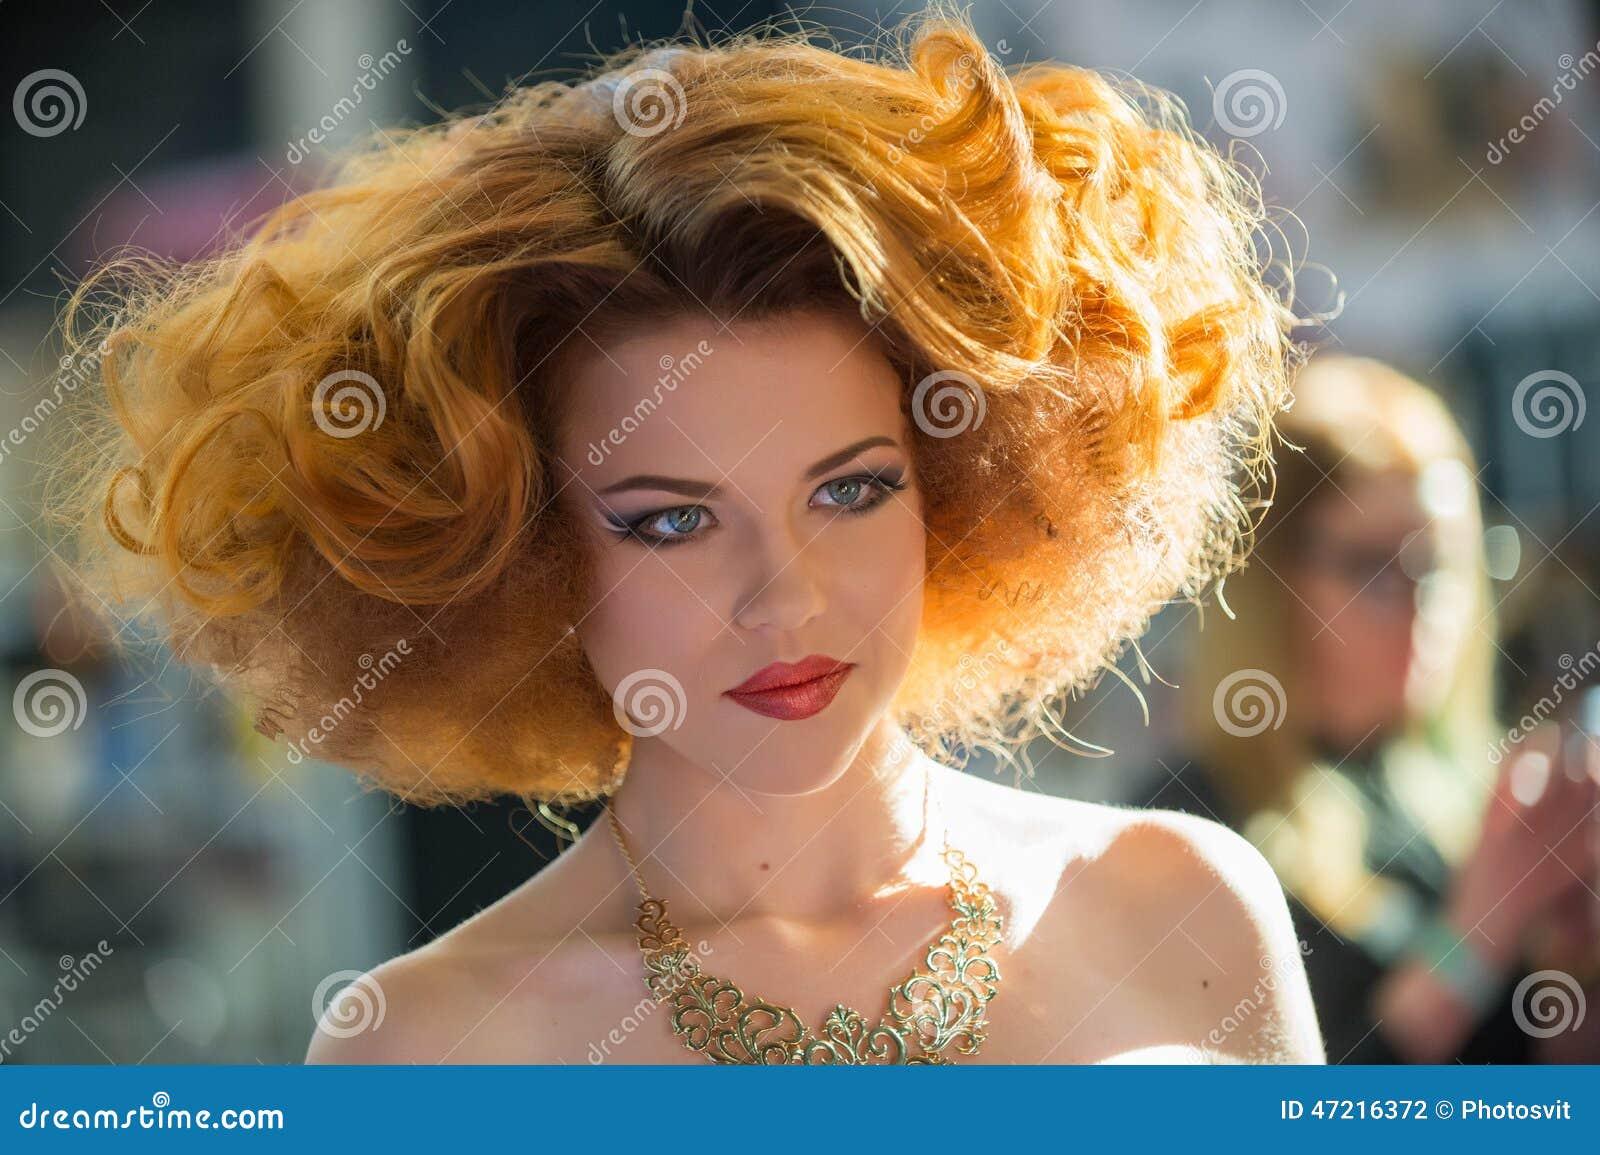 Beautiful Woman With Haircut And Makeup Cartoon Vector 91586317